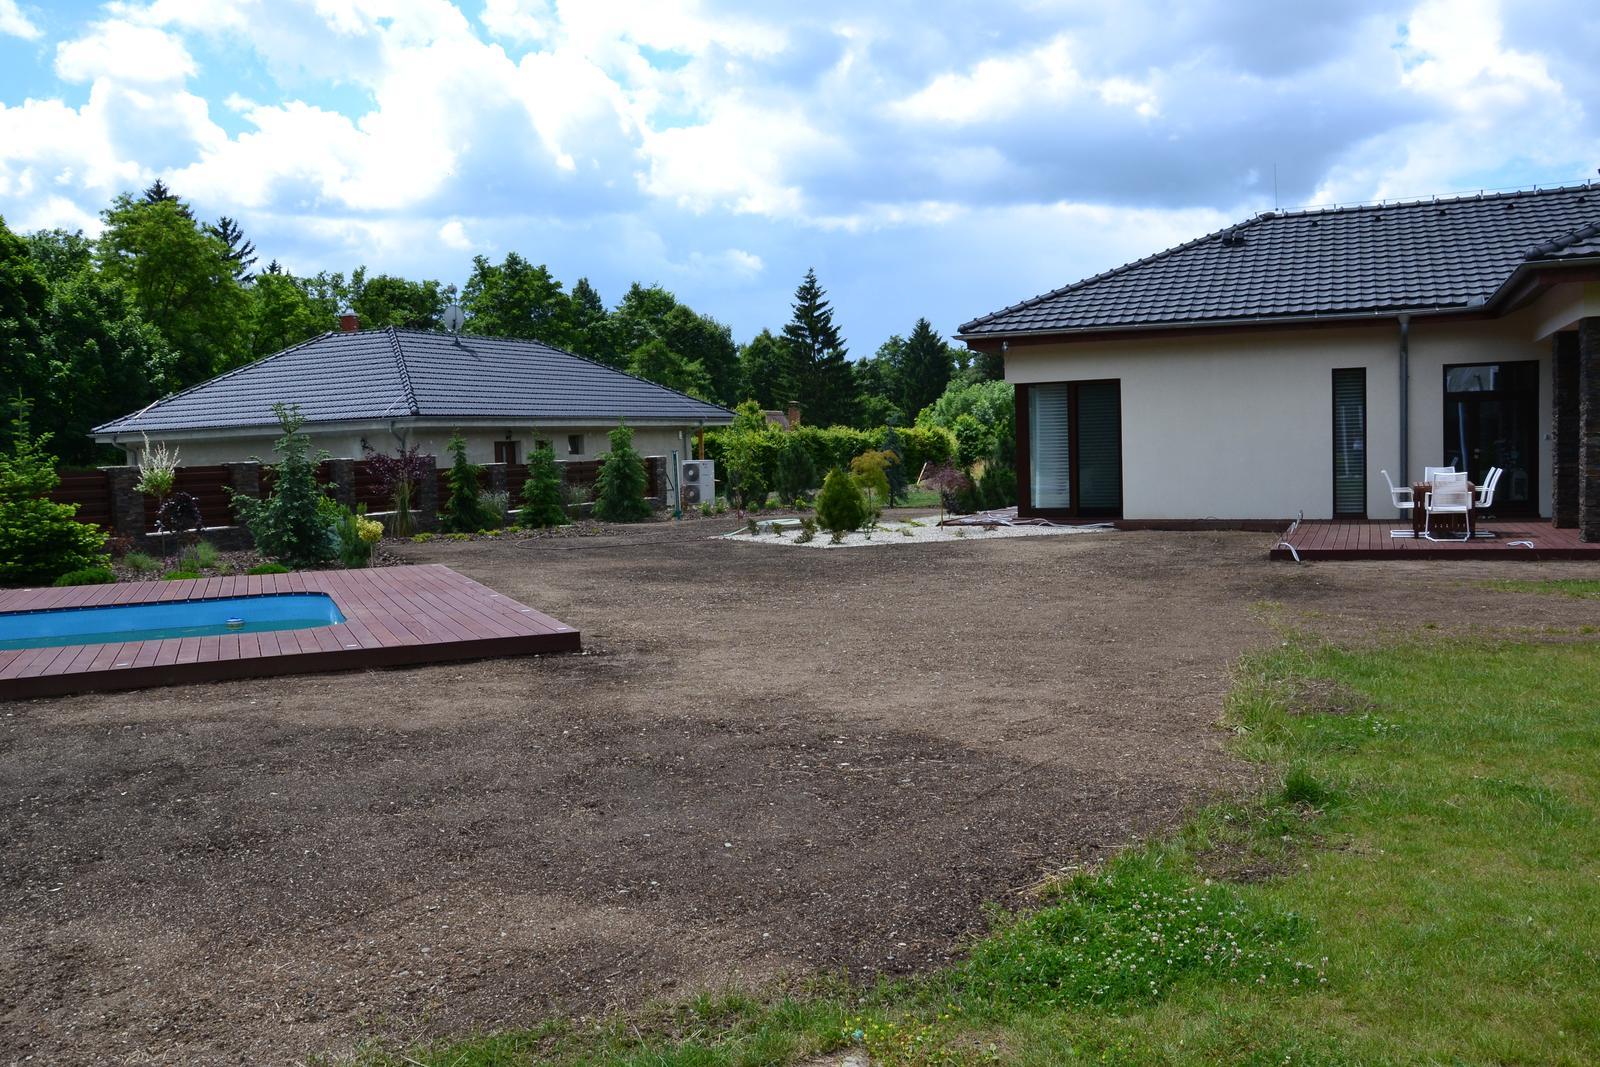 Zahrada - Obrázek č. 98